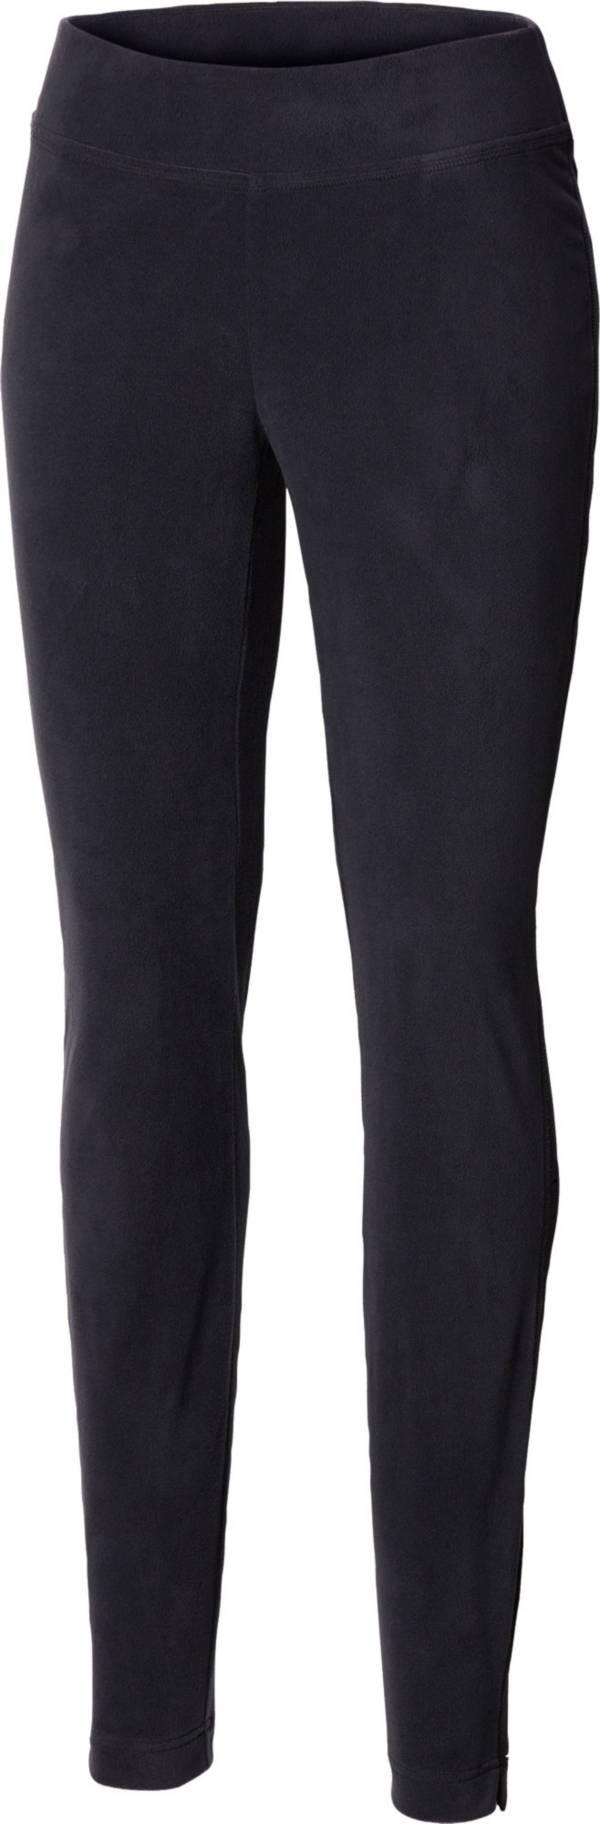 Columbia Women's Glacial Fleece Printed Leggings product image